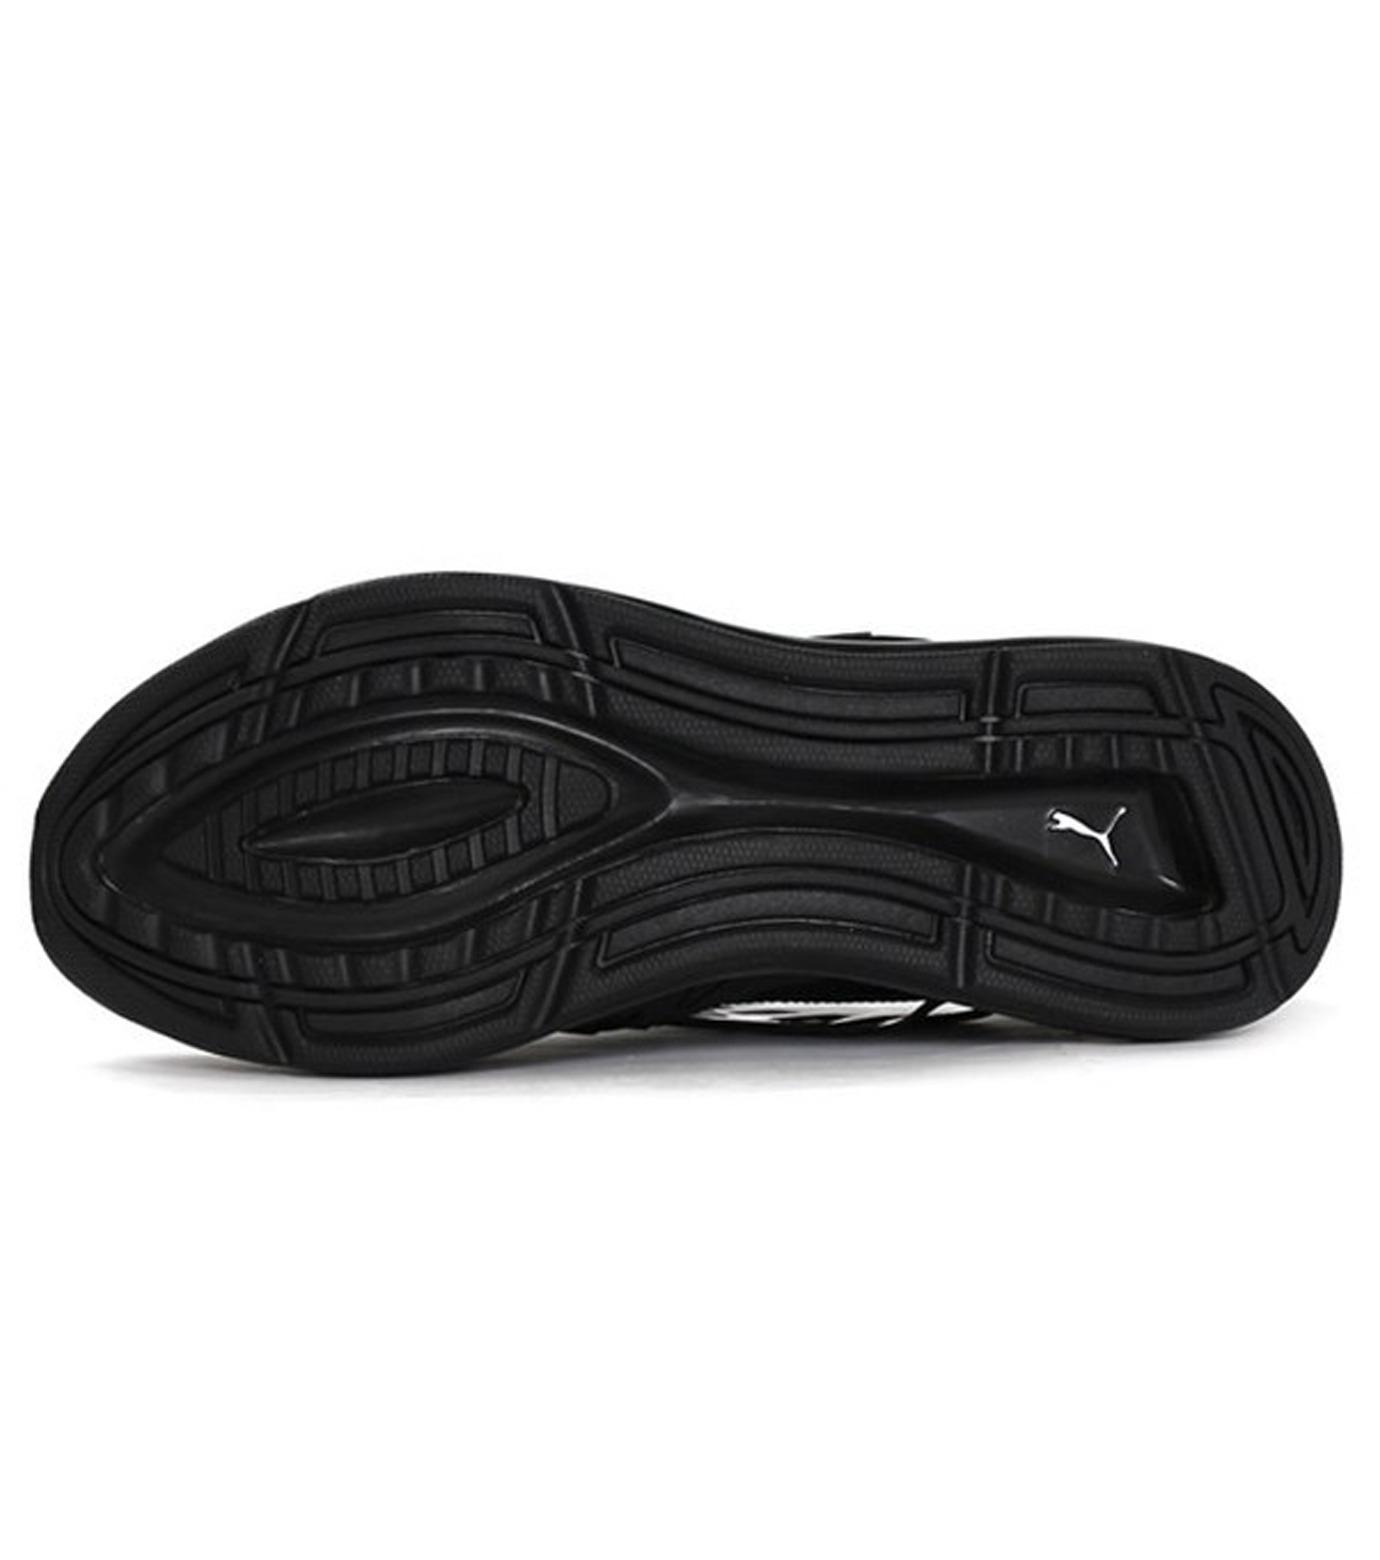 PUMA(プーマ)のDISC BLAZE CELL-BLACK(シューズ/shoes)-360078-13 拡大詳細画像2